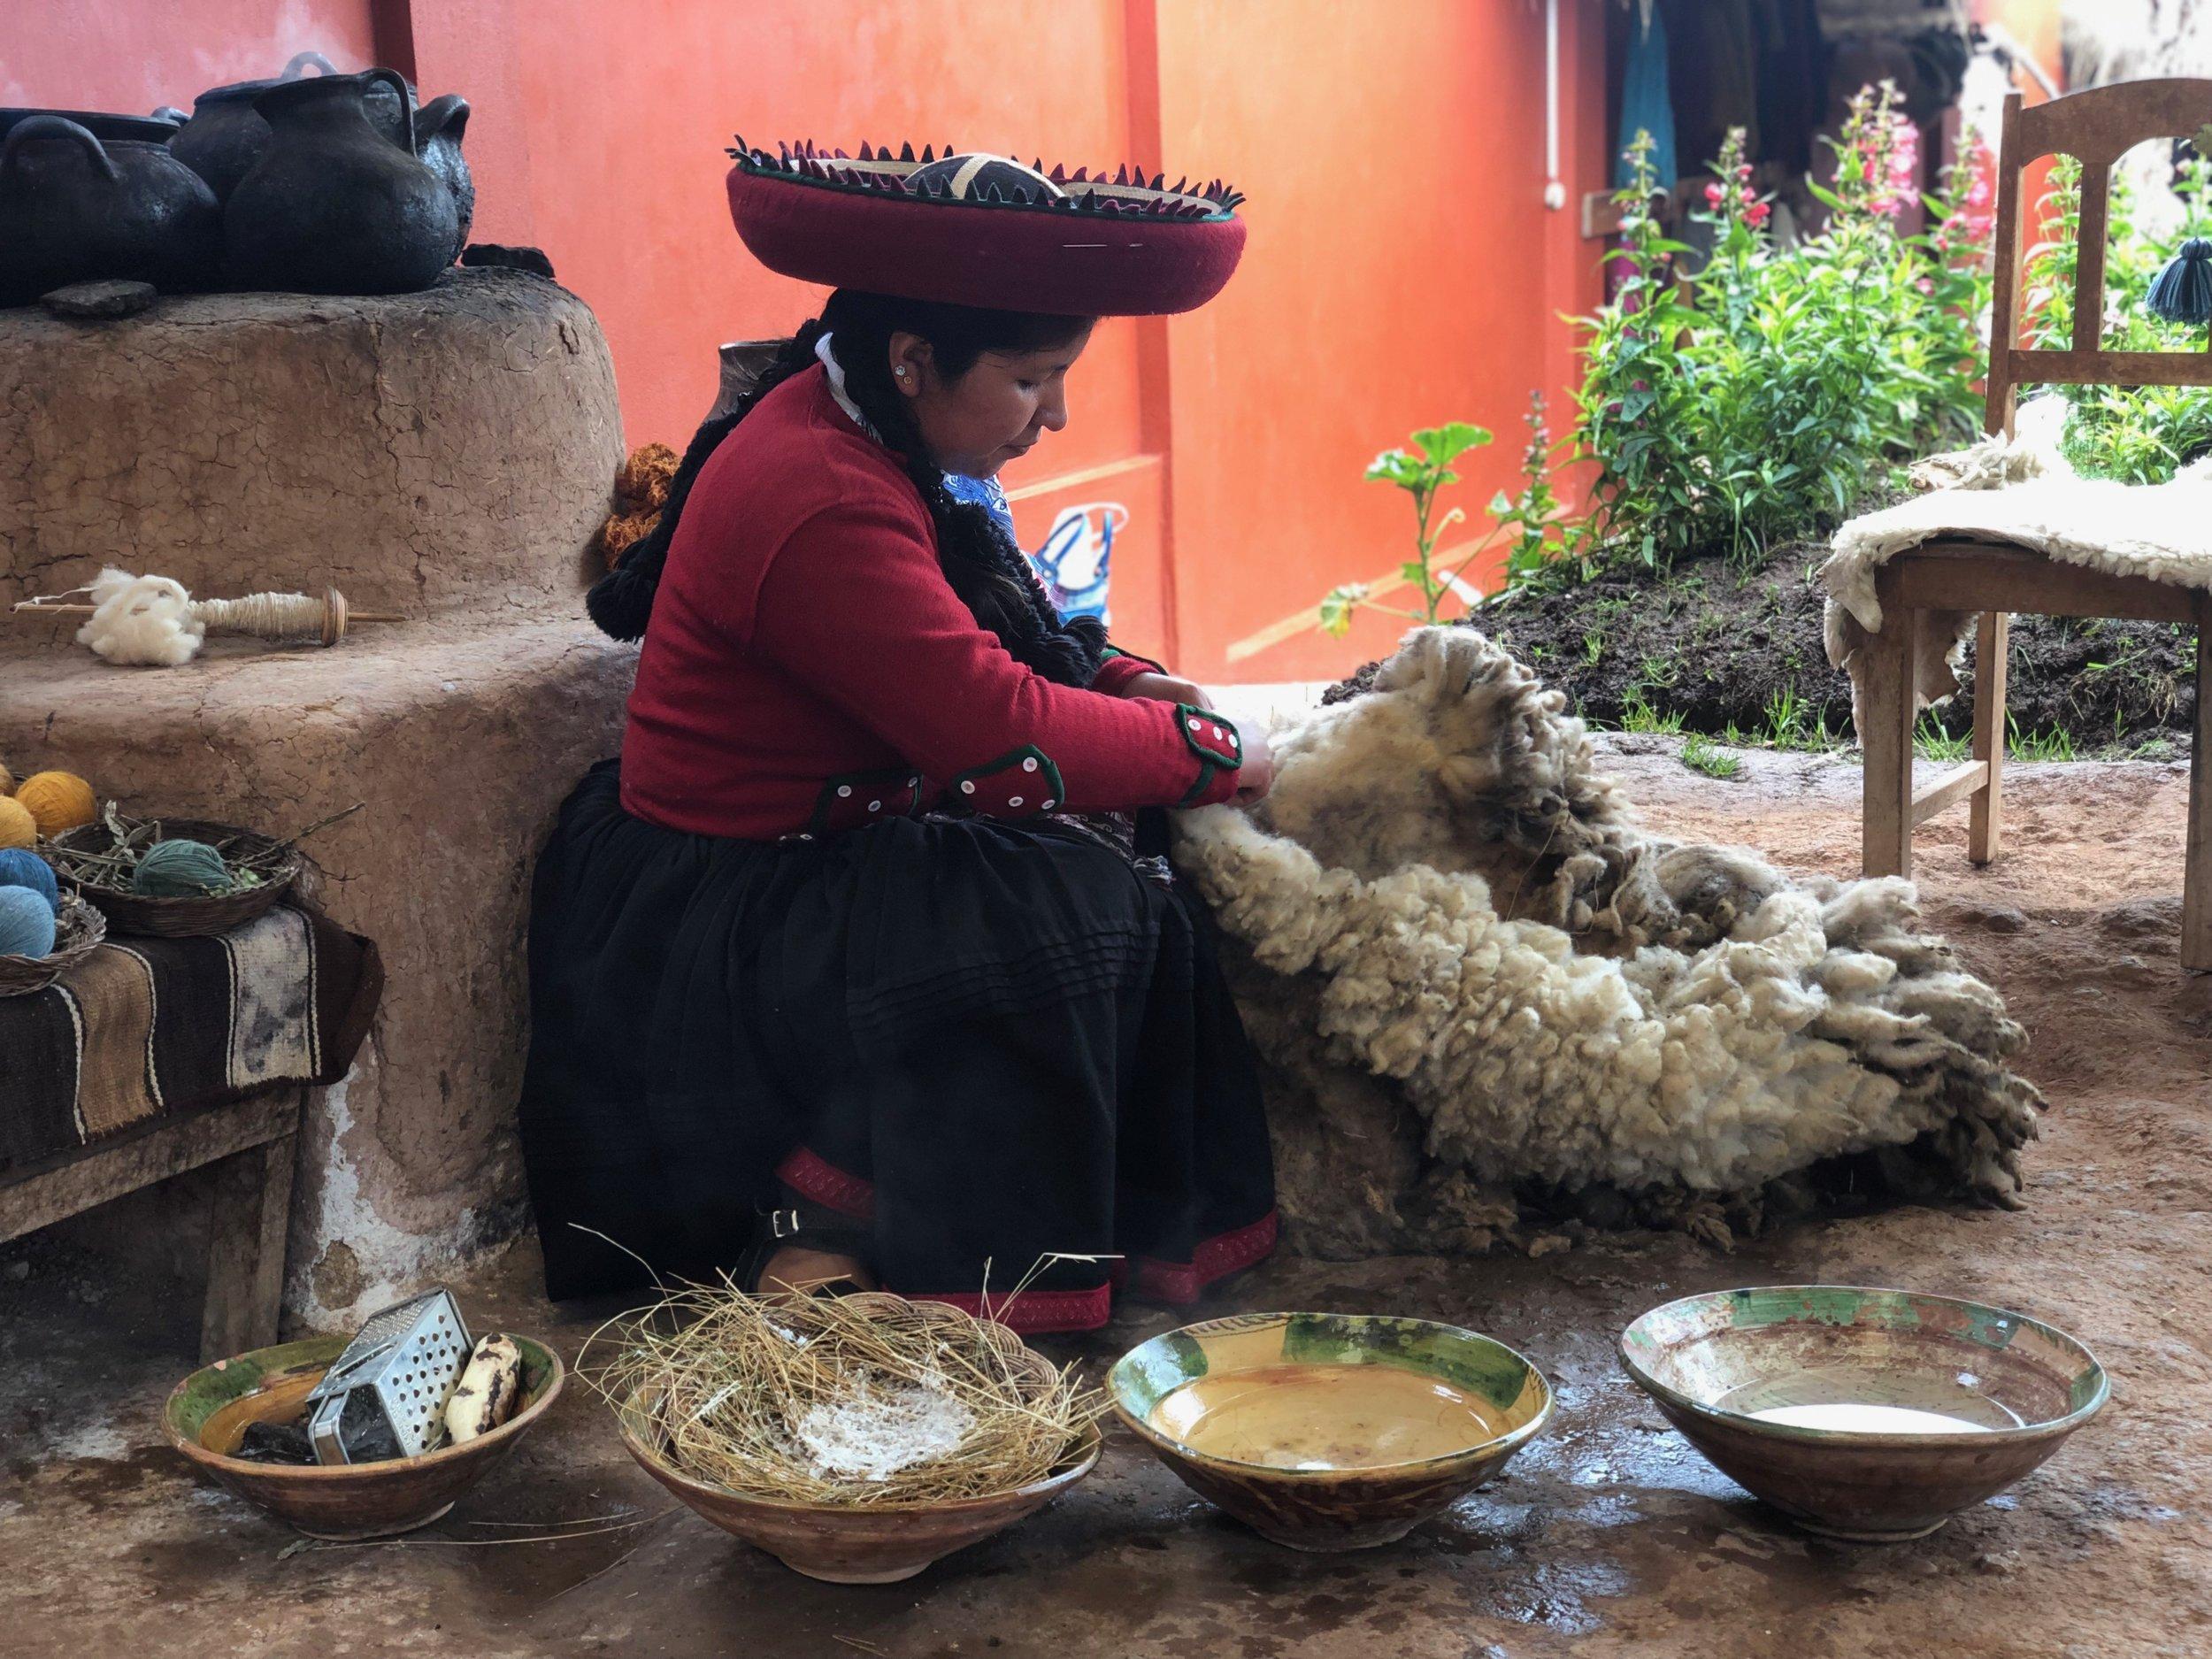 Chinchero-weaving-sacred-valley-textiles-peru-south-america